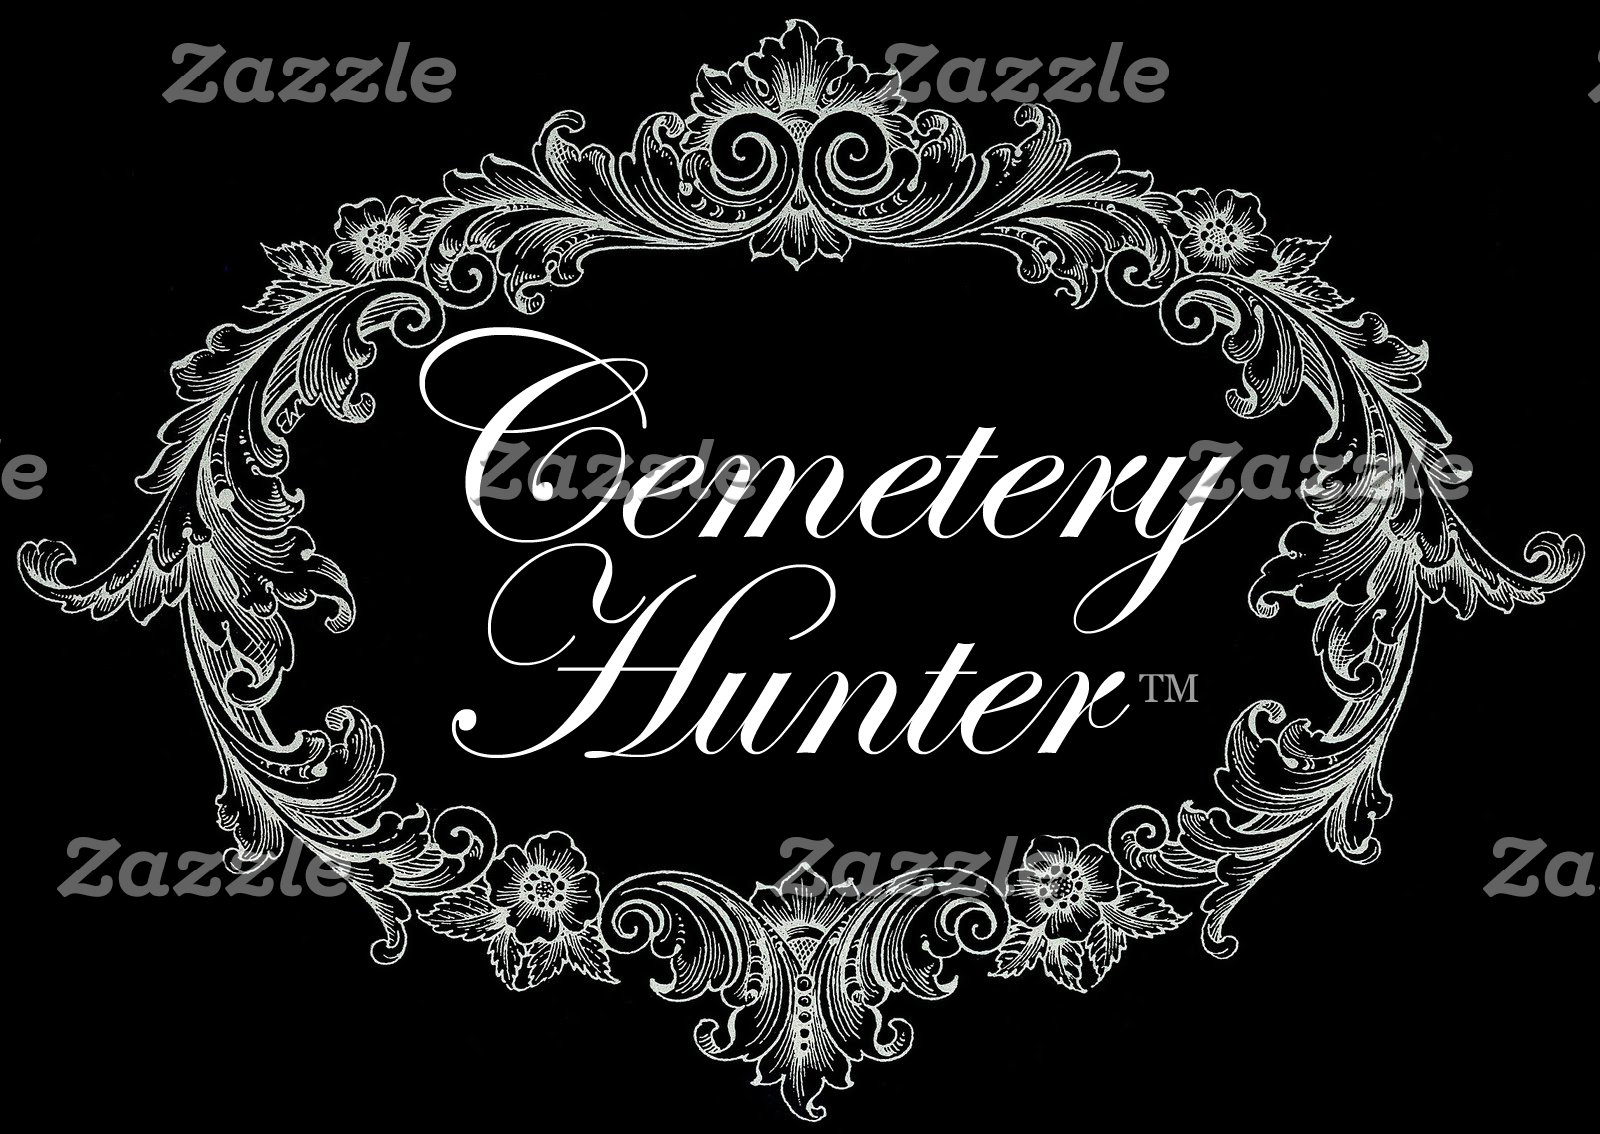 Cemetery Hunter